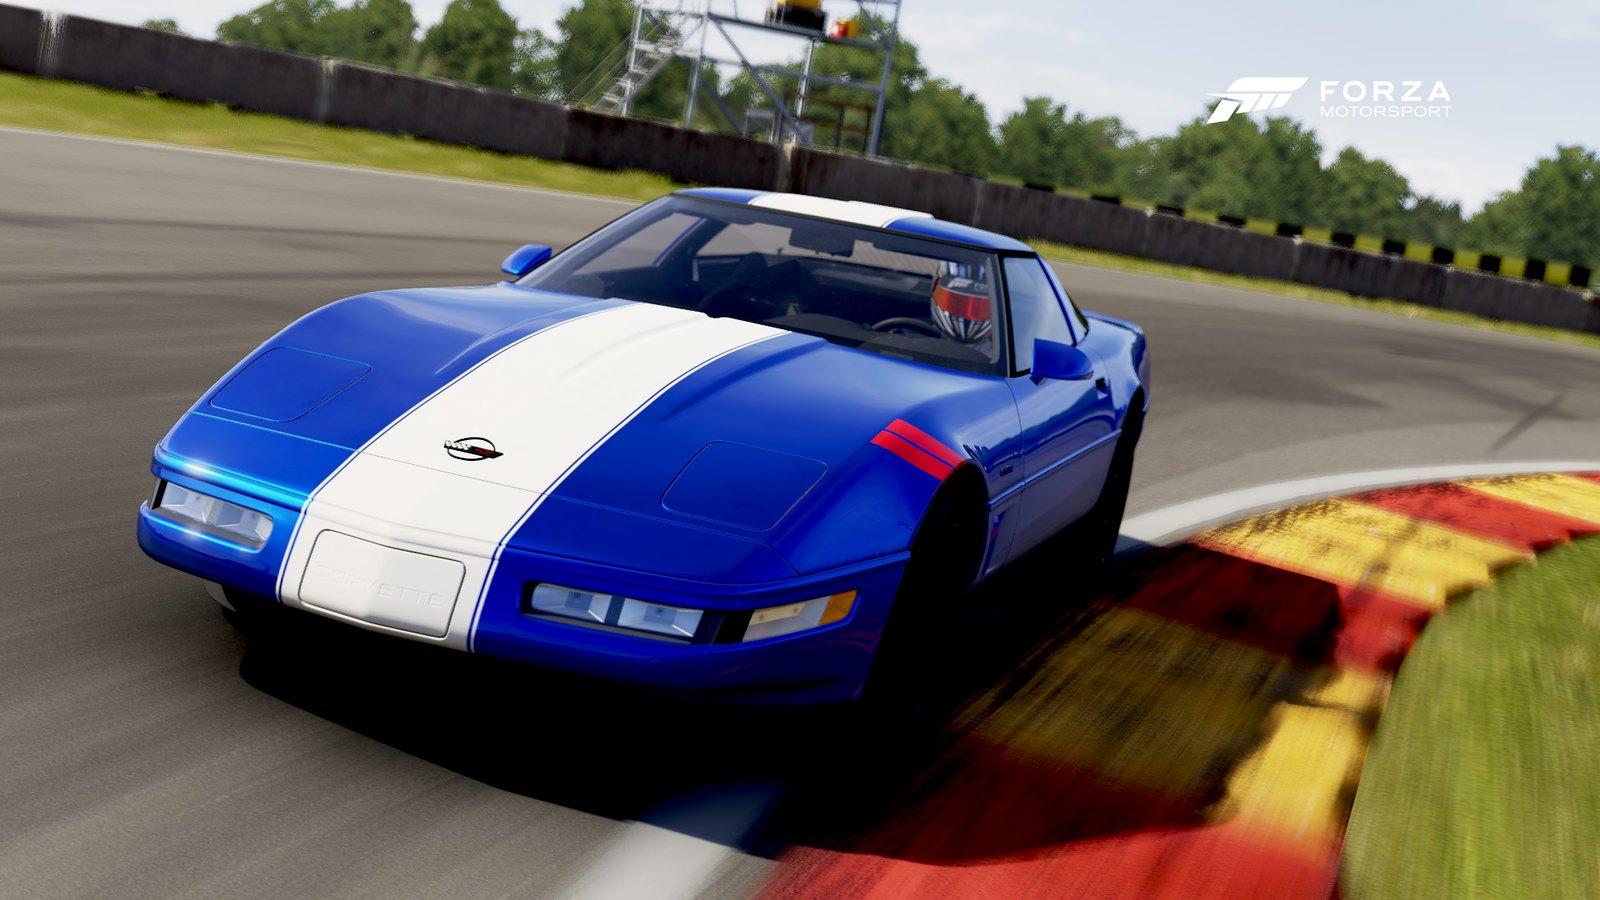 Bugatti Veyron Going Back To The Future Art Promo: [REPLICA] VProCar's Replica Paint Shop